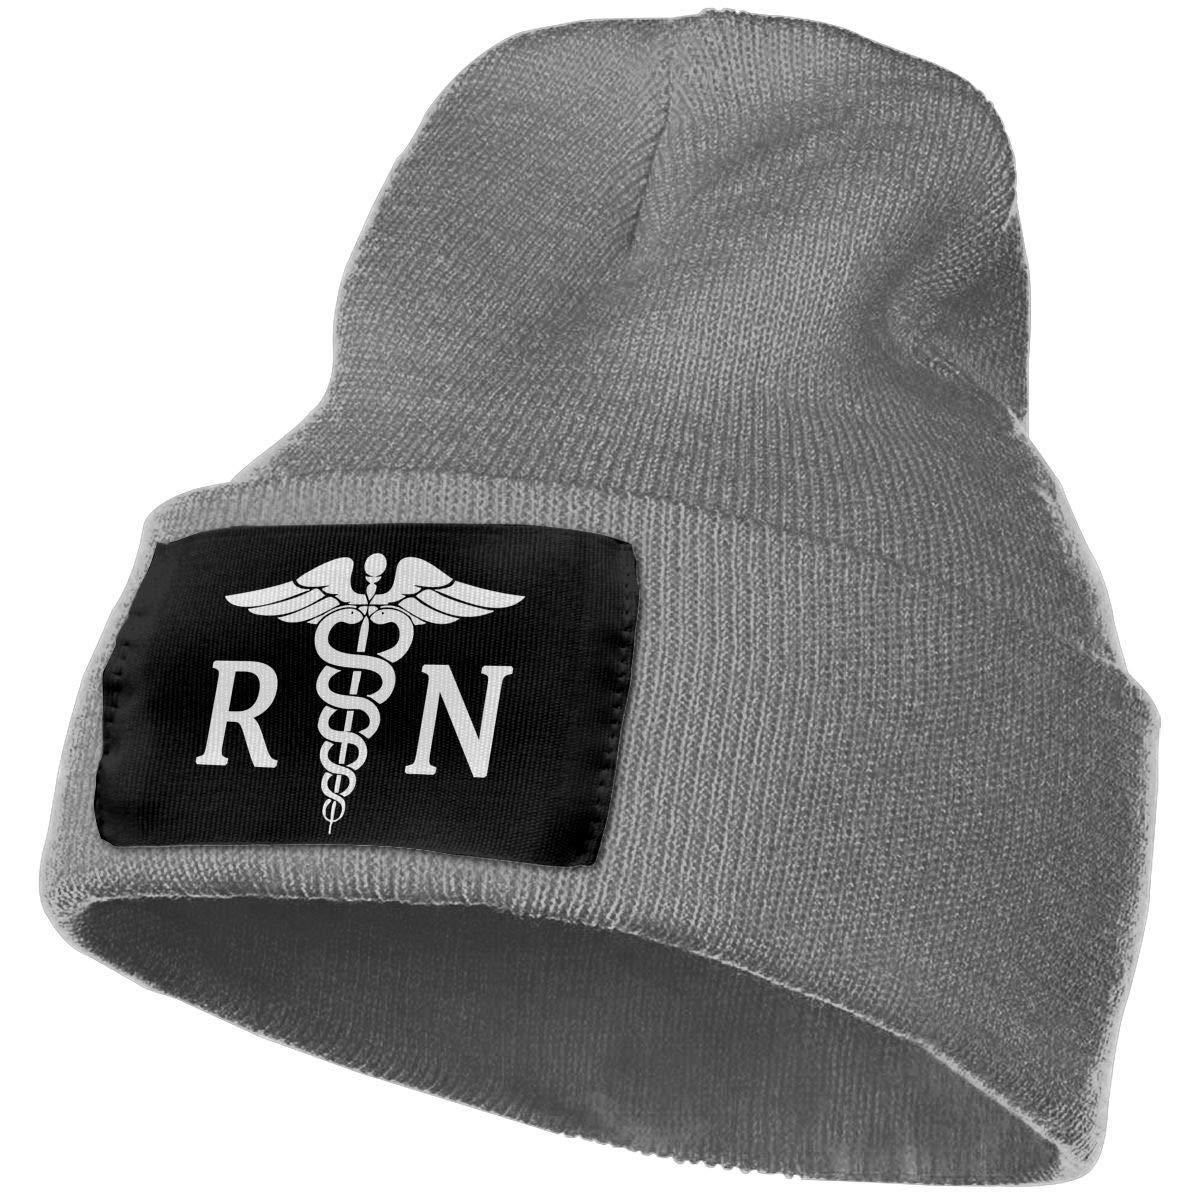 Unisex Winter Hats Nurse Symbol Skull Caps Knit Hat Cap Beanie Cap for Men//Womens